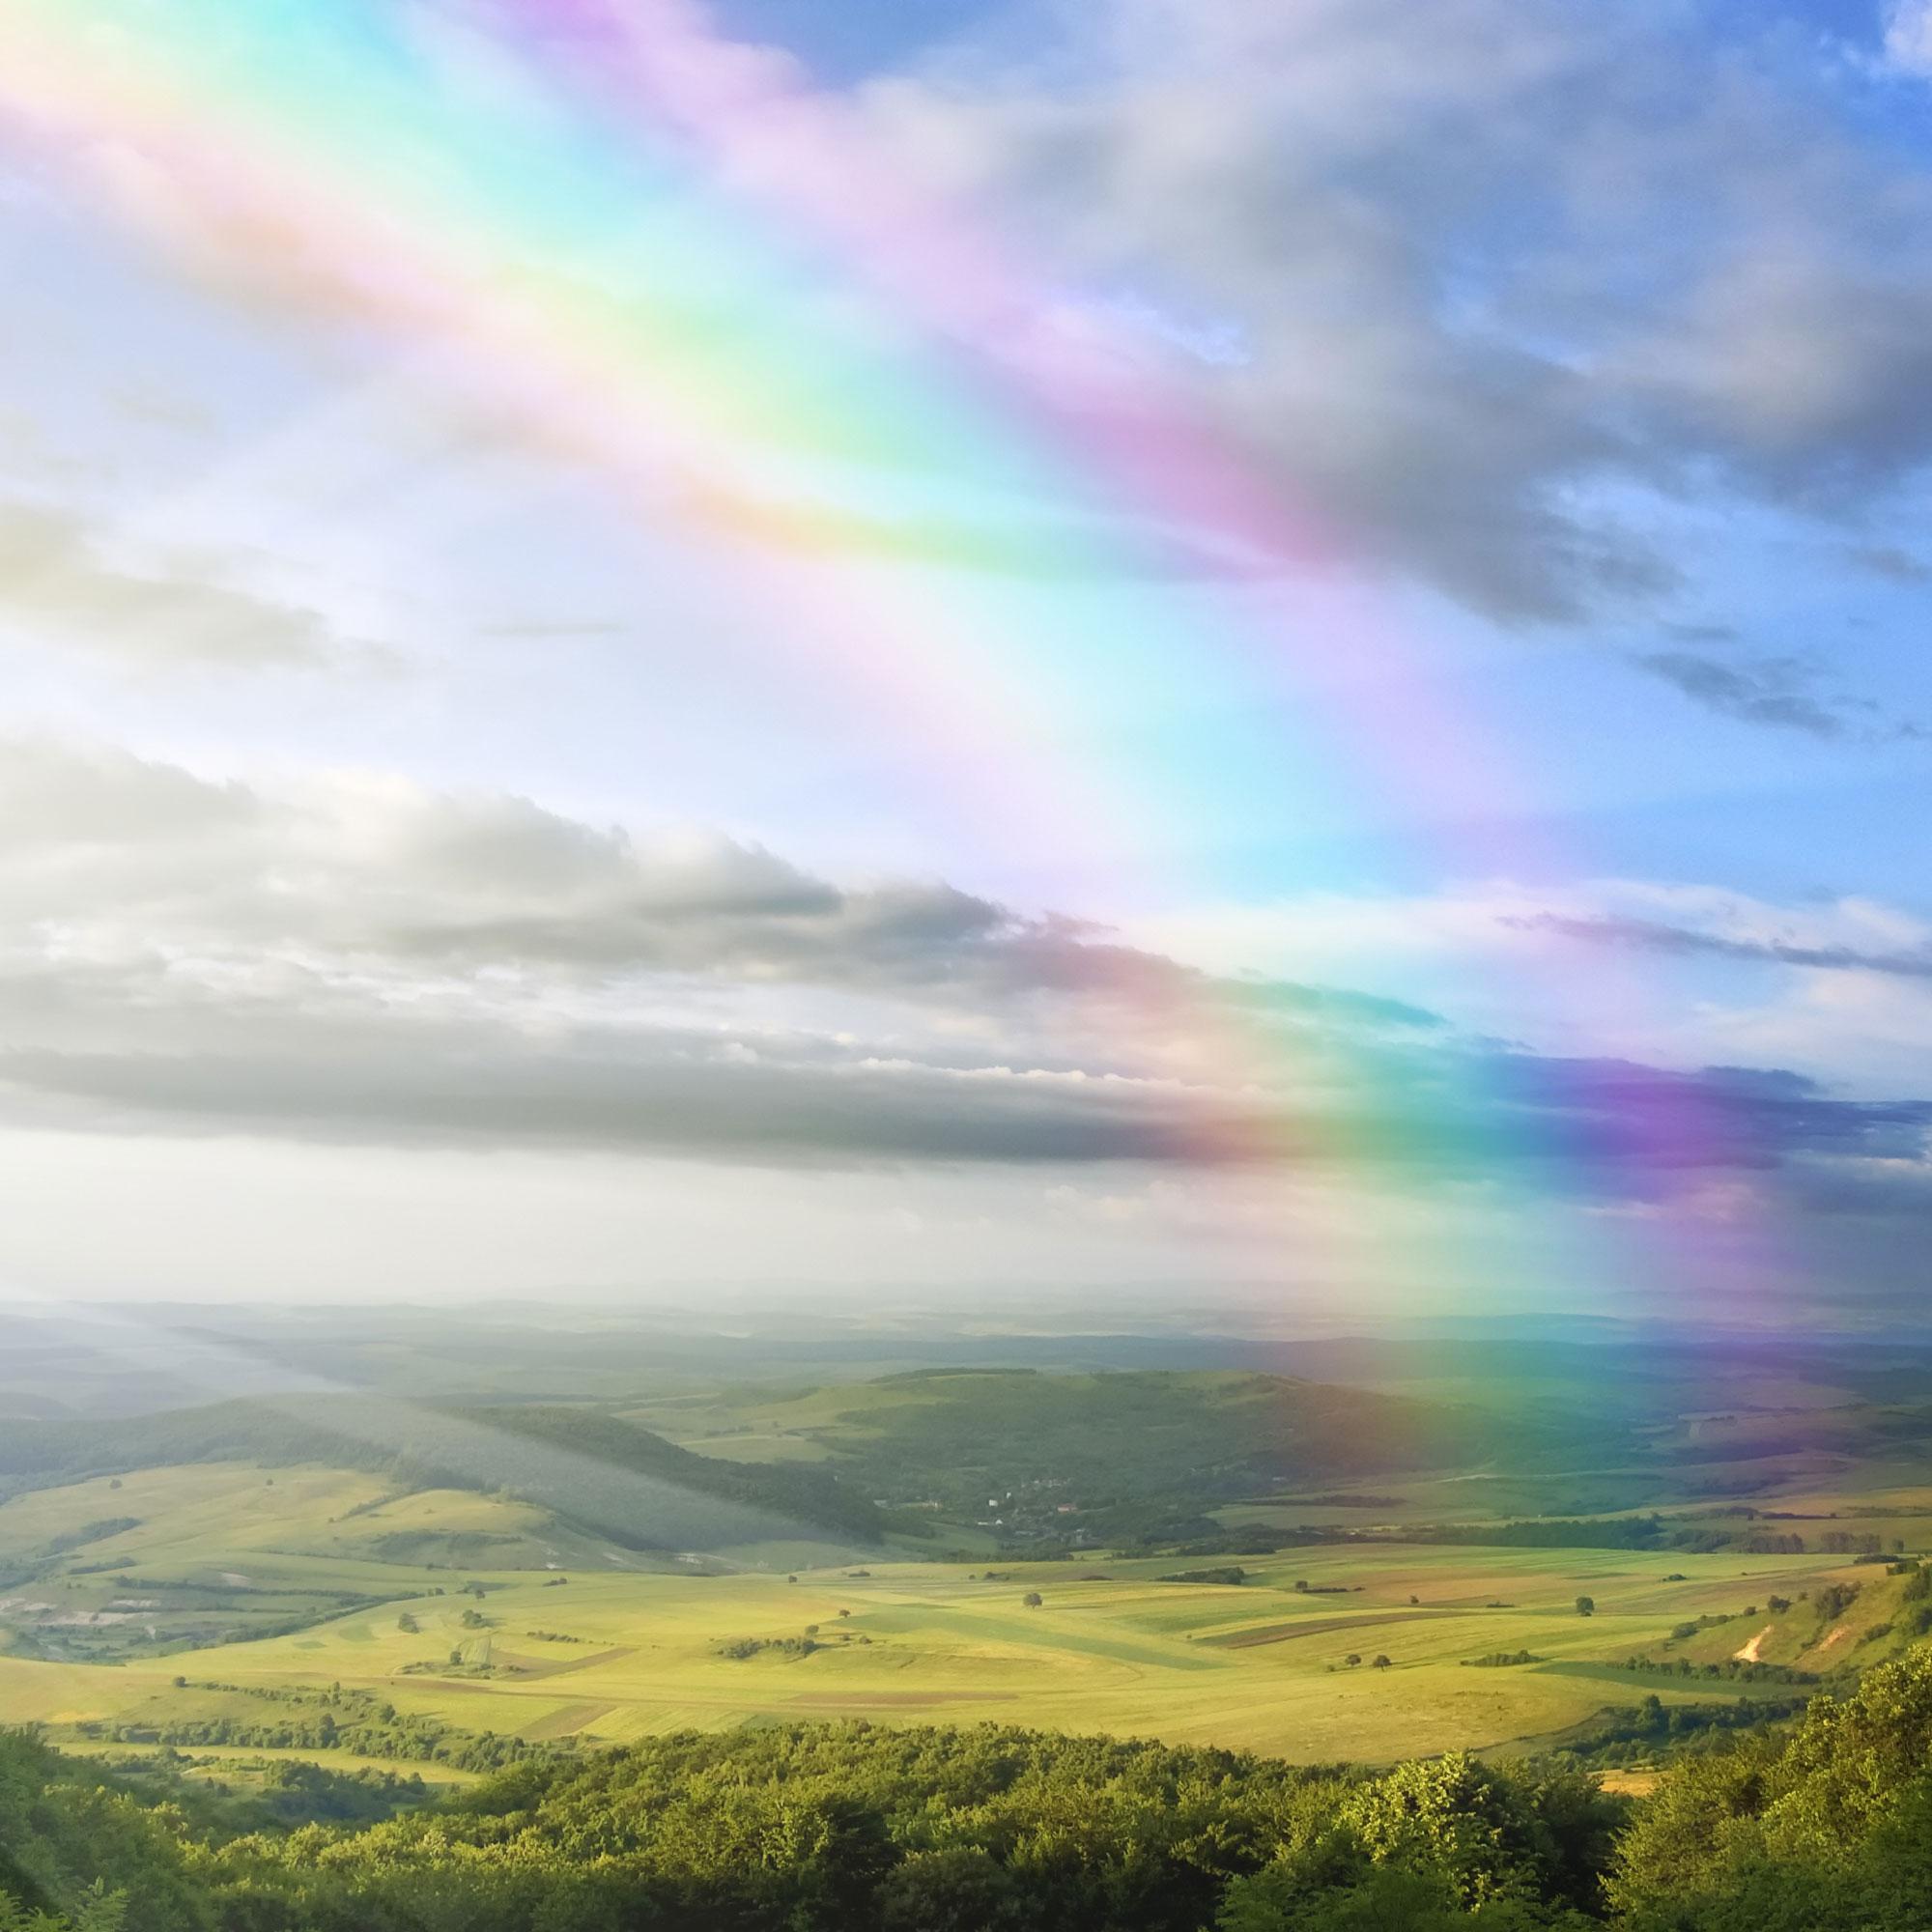 144000 the warriors of the rainbow